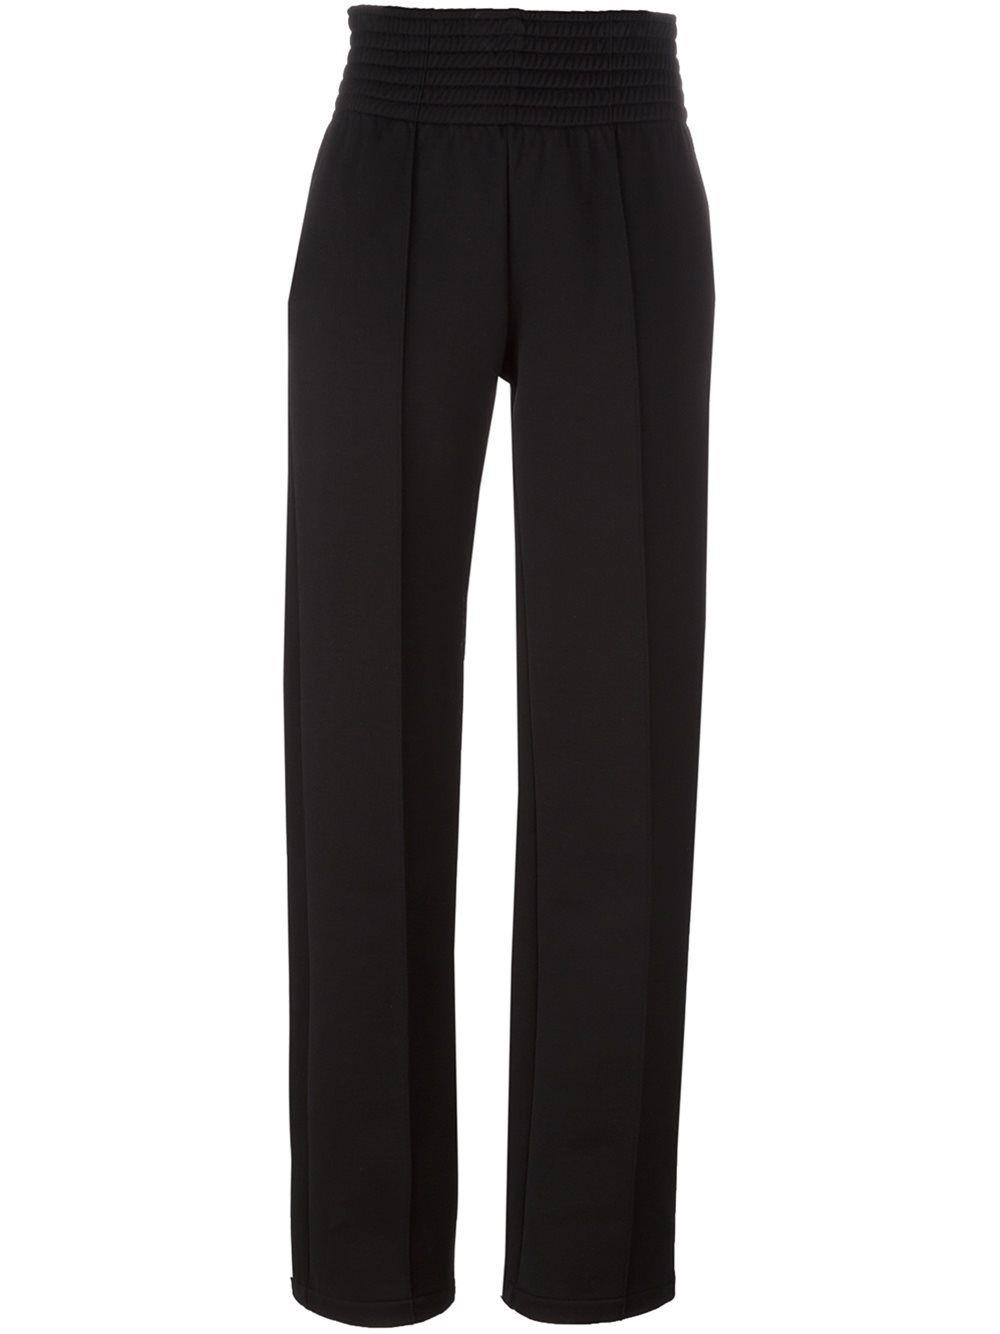 Pantalones Cropped Rectos para Mujer Marca find